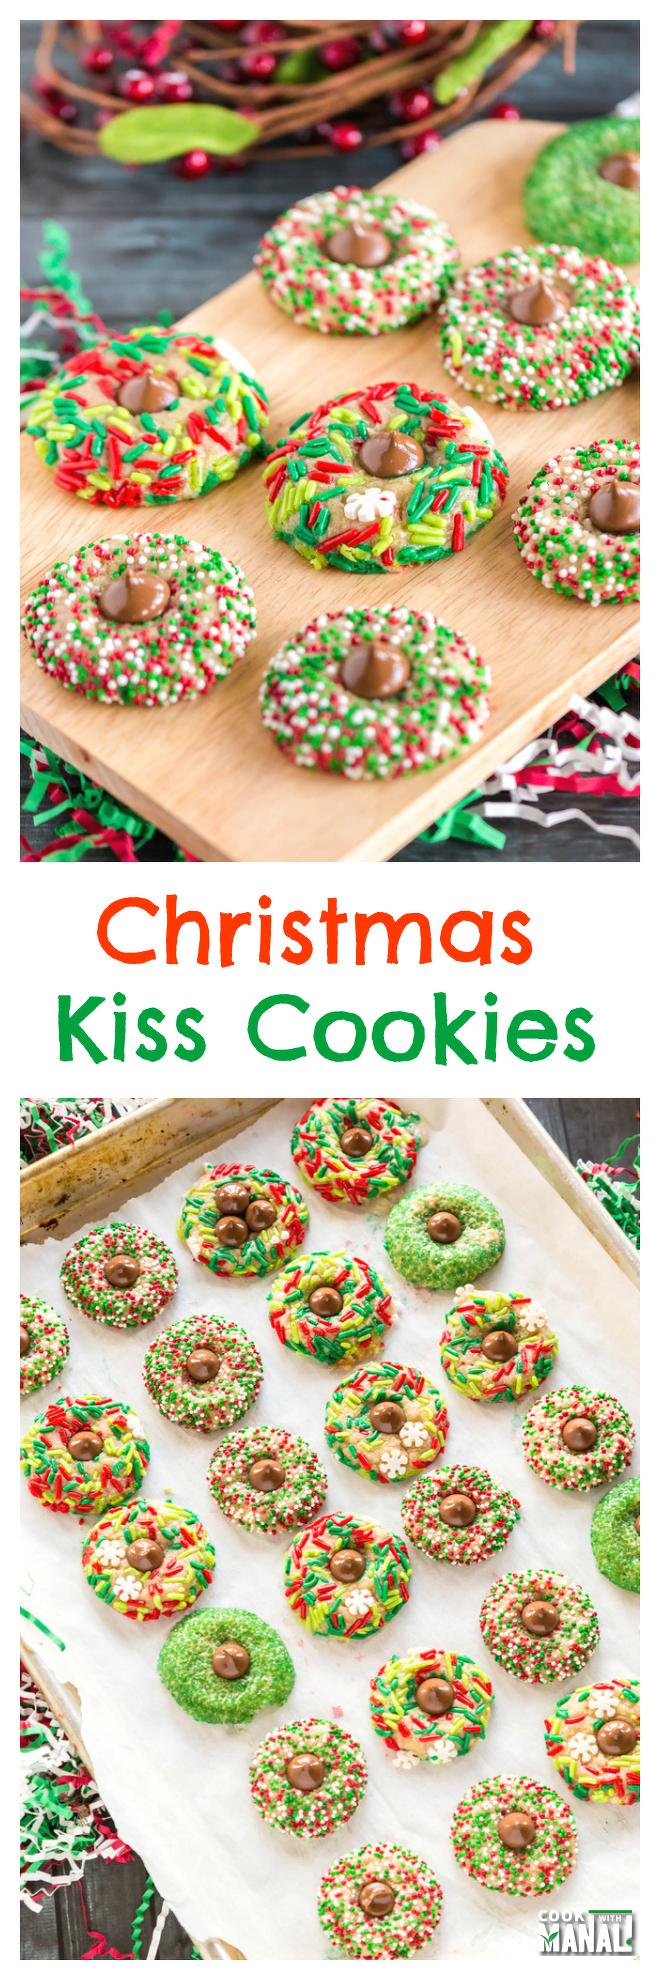 Christmas Kiss Cookies Collage